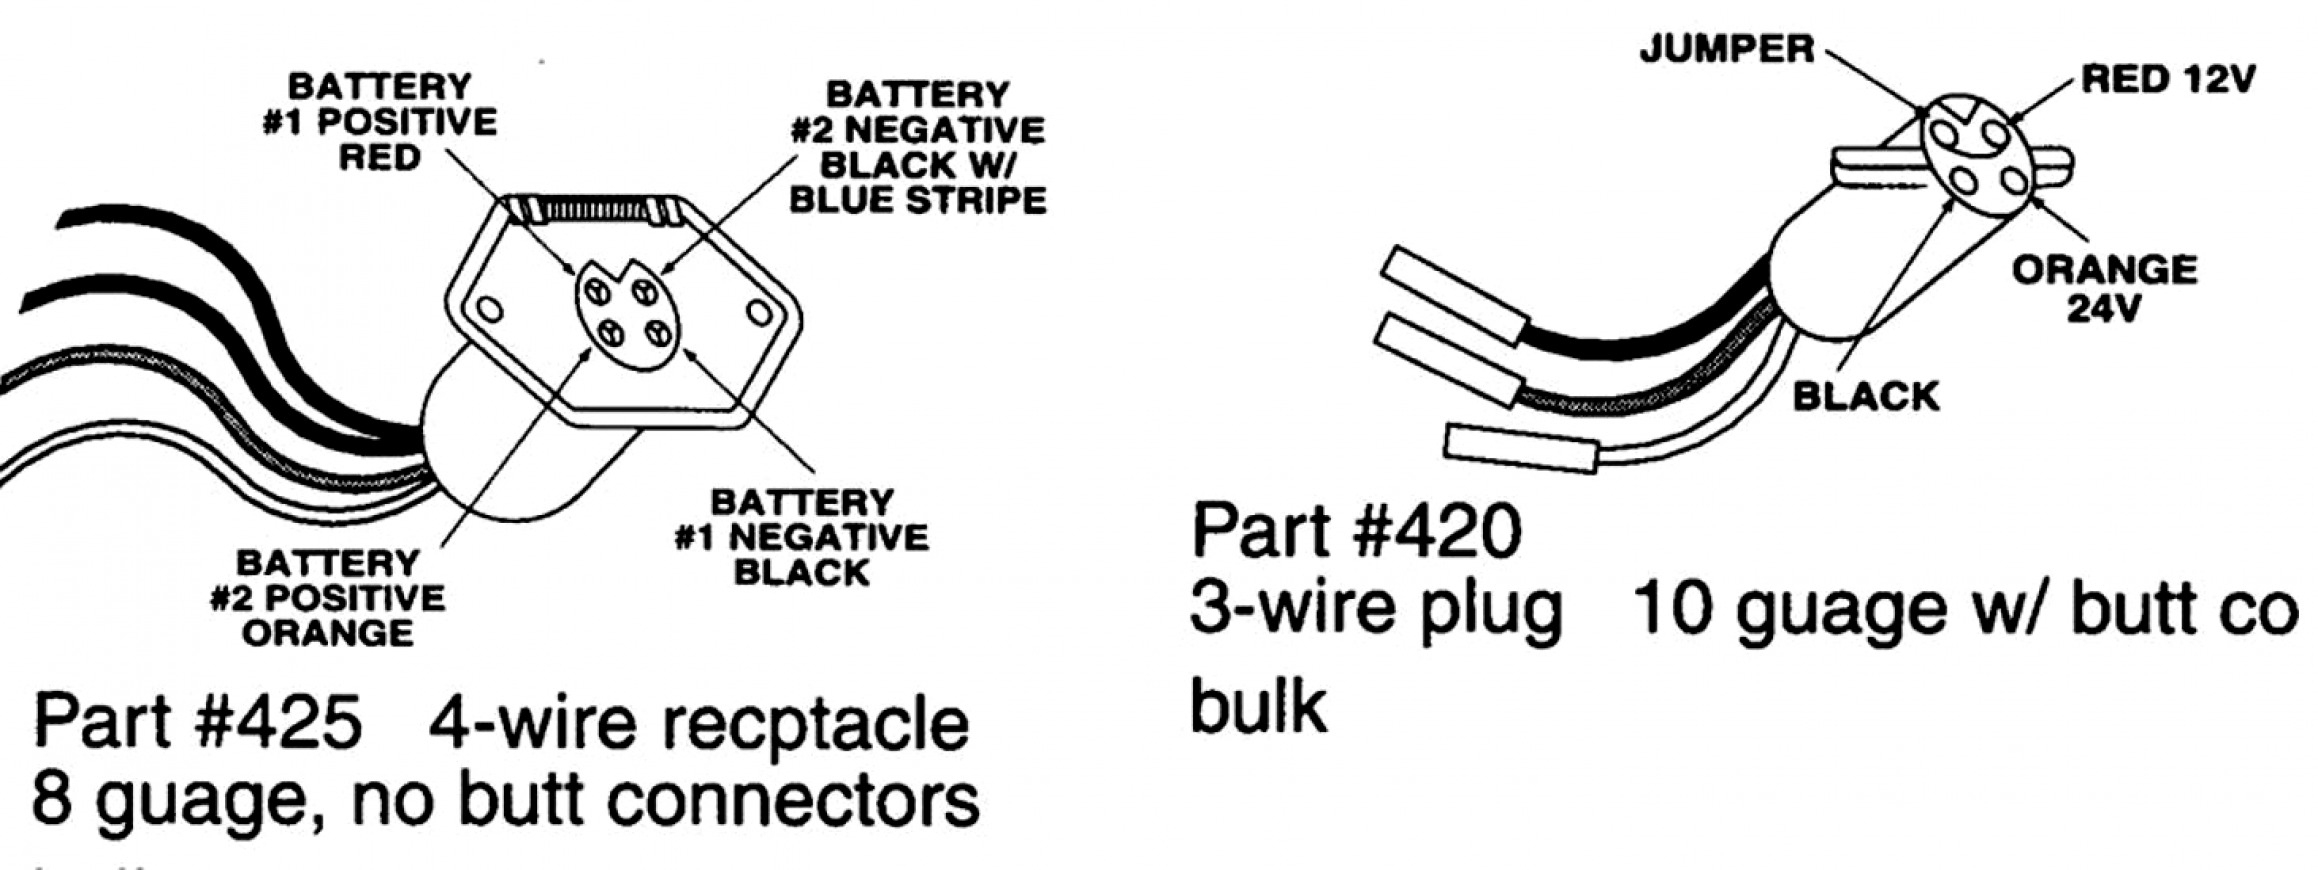 12 24 Volt Trolling Motor Wiring Diagram | Wiring Diagram - 12 24 Volt Trolling Motor Wiring Diagram